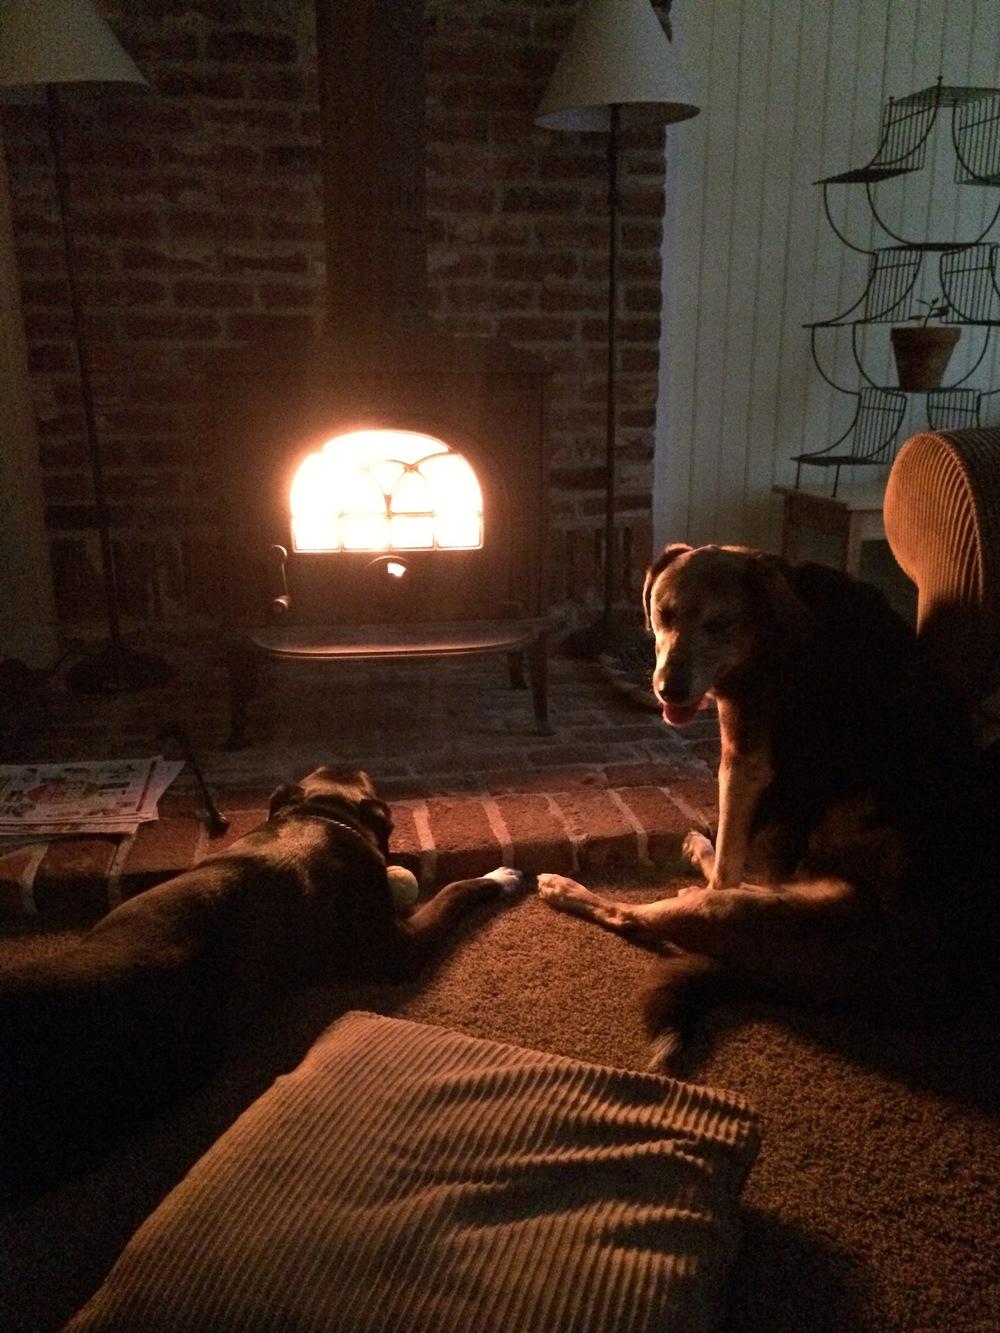 Baberham & Toki = fireplace fans.